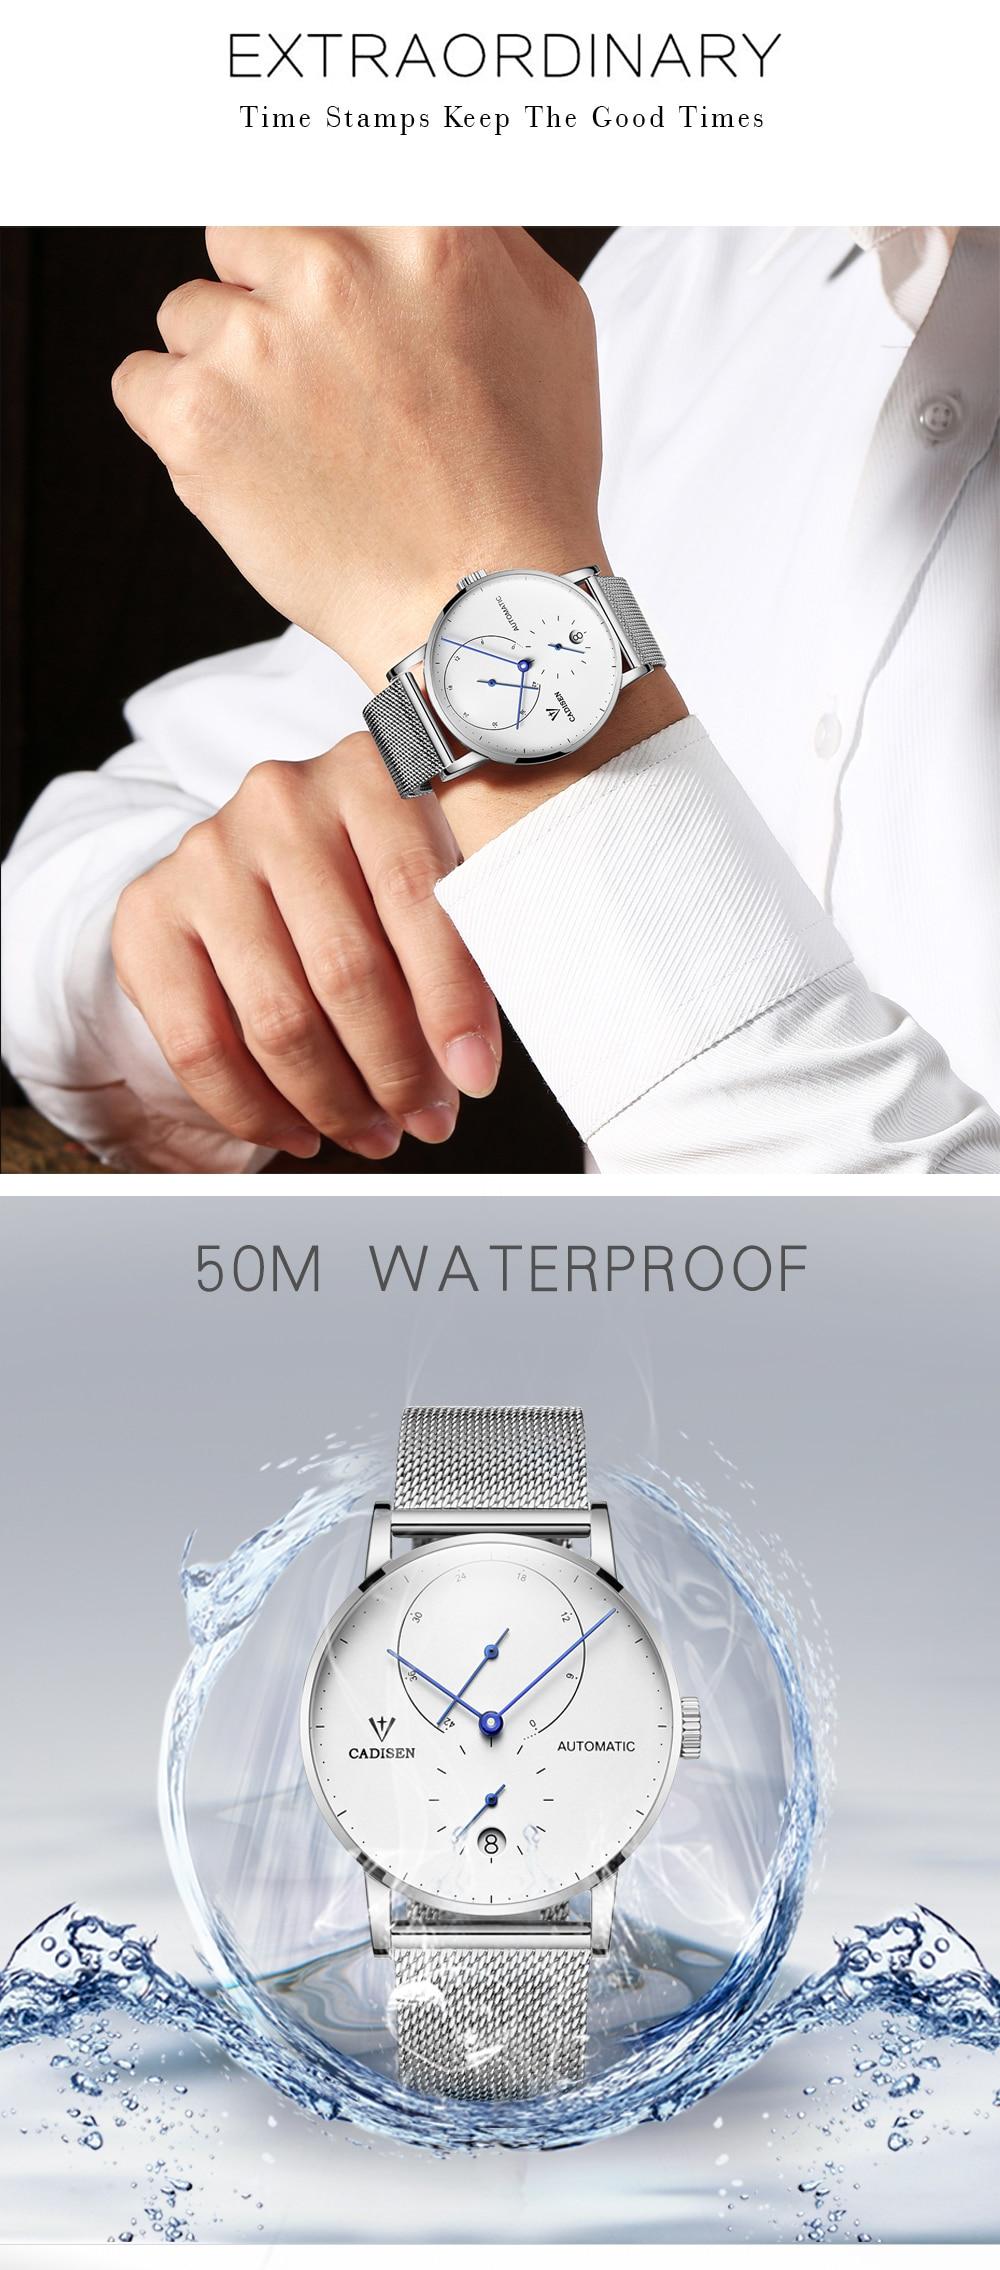 HTB1z03tDeuSBuNjSsziq6zq8pXao Mens Watches CADISEN 2019 Top Luxury Brand Automatic Mechanical Watch Men Full Steel Business Waterproof Fashion Sport Watches